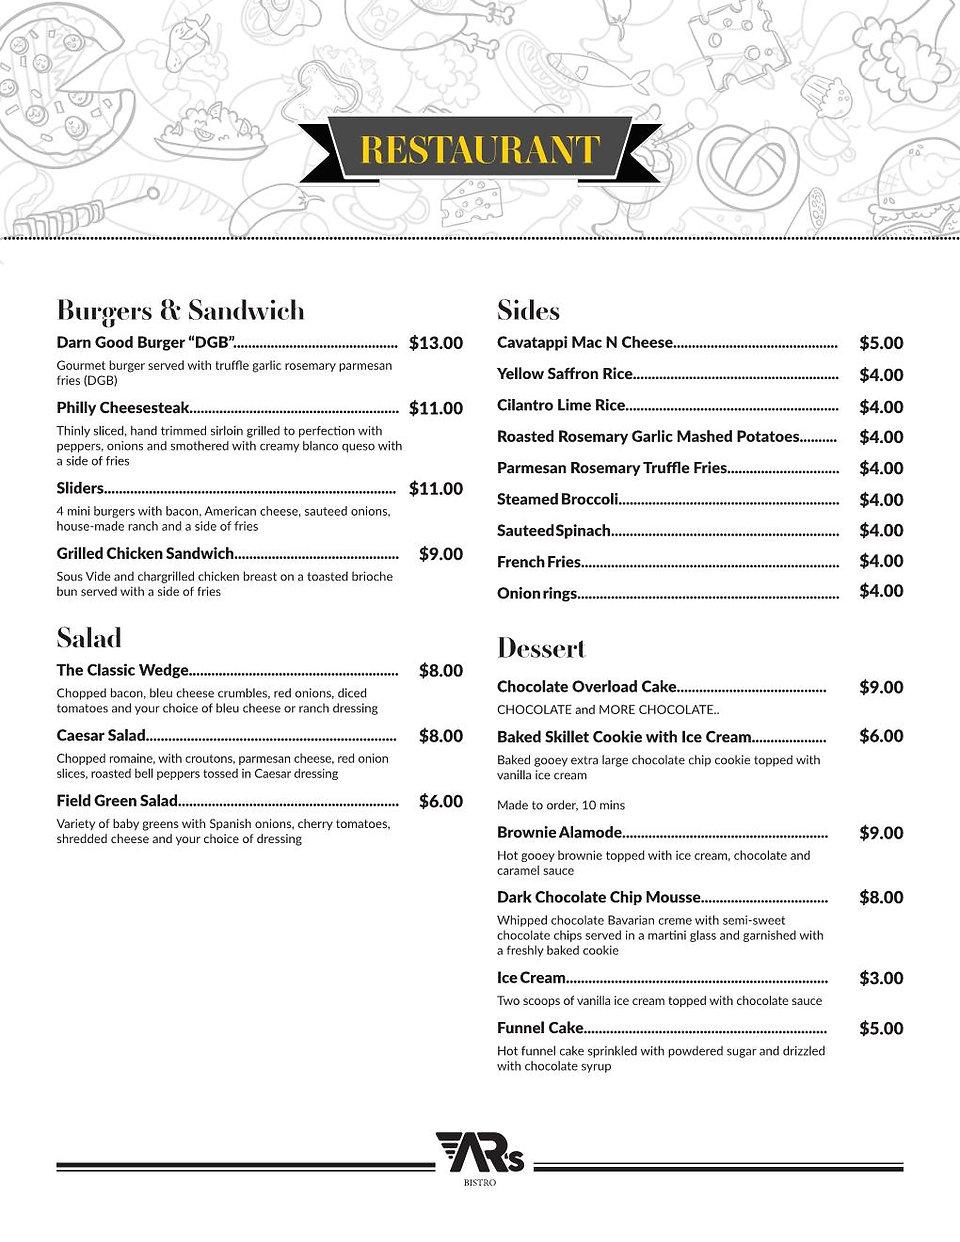 AR_restaurant_MAR-19 Page 003.jpg